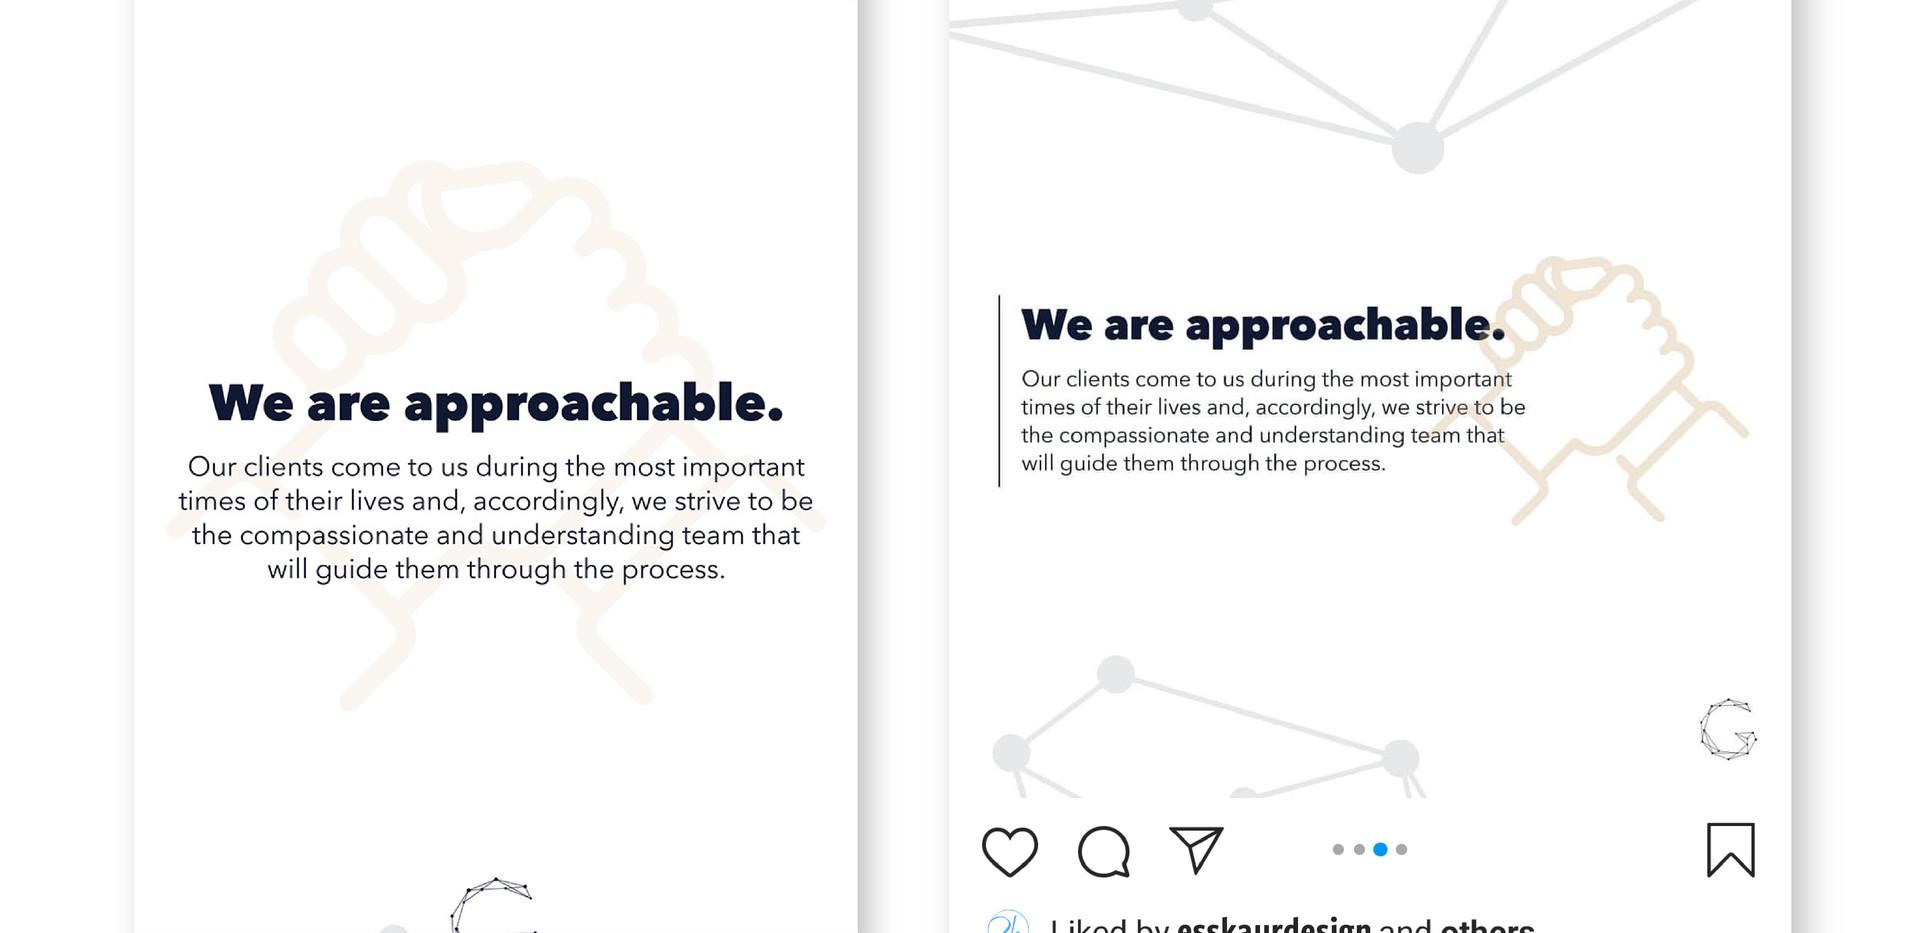 GS Brar Law - Digital Marketing (Branded)